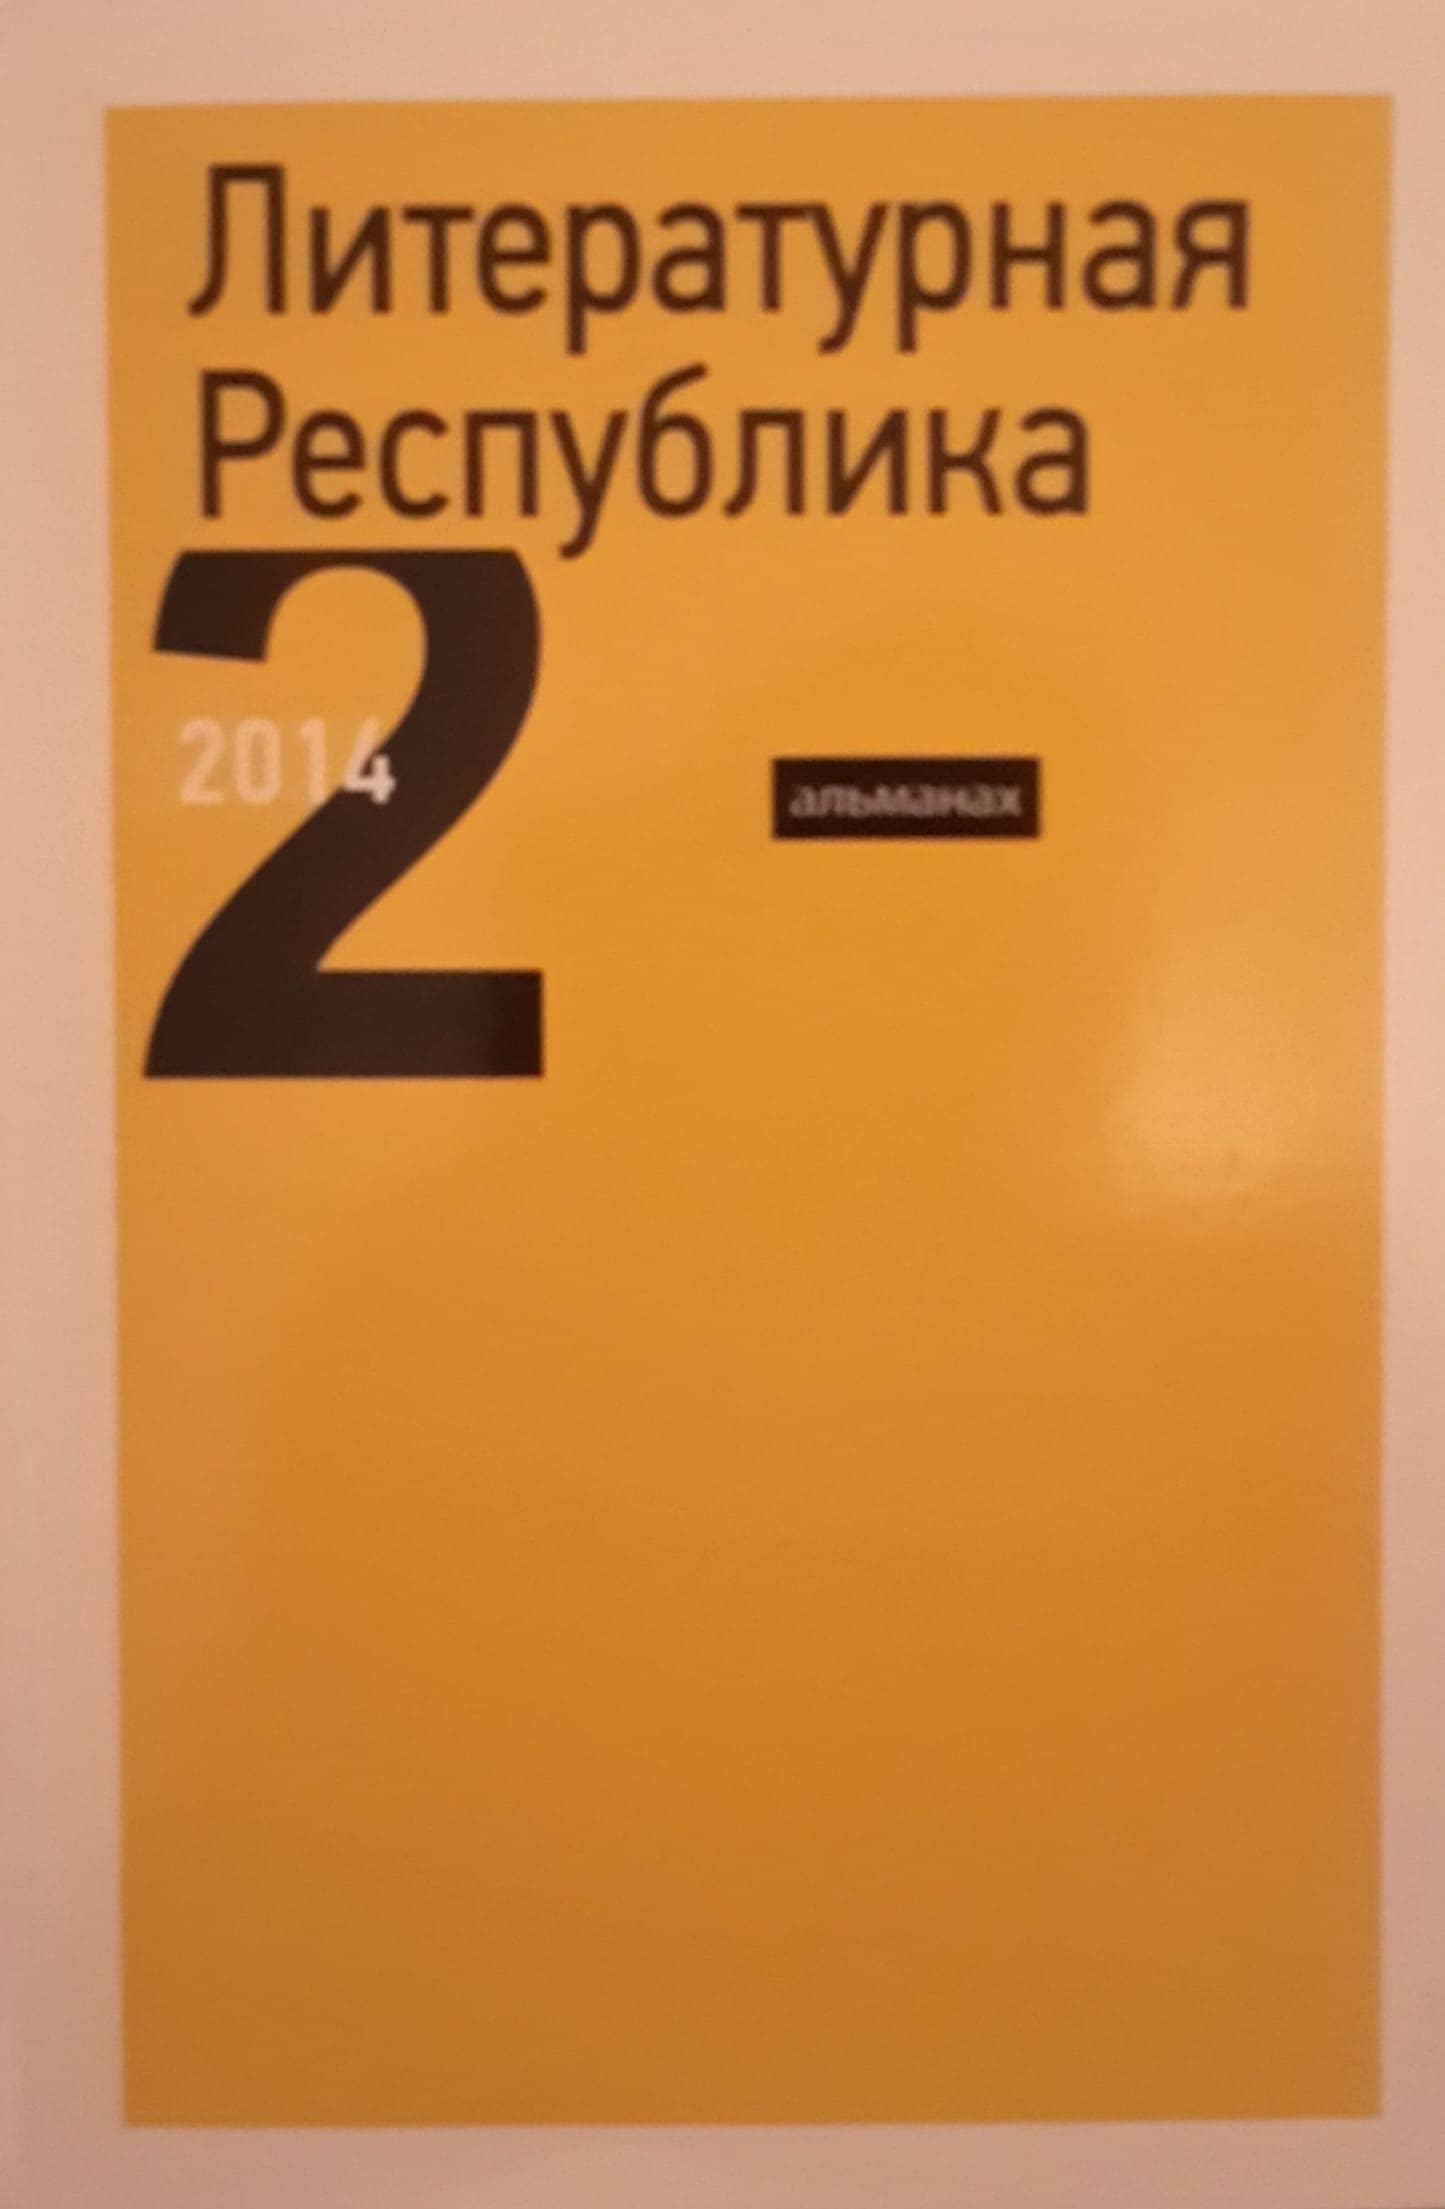 lr_14.jpg